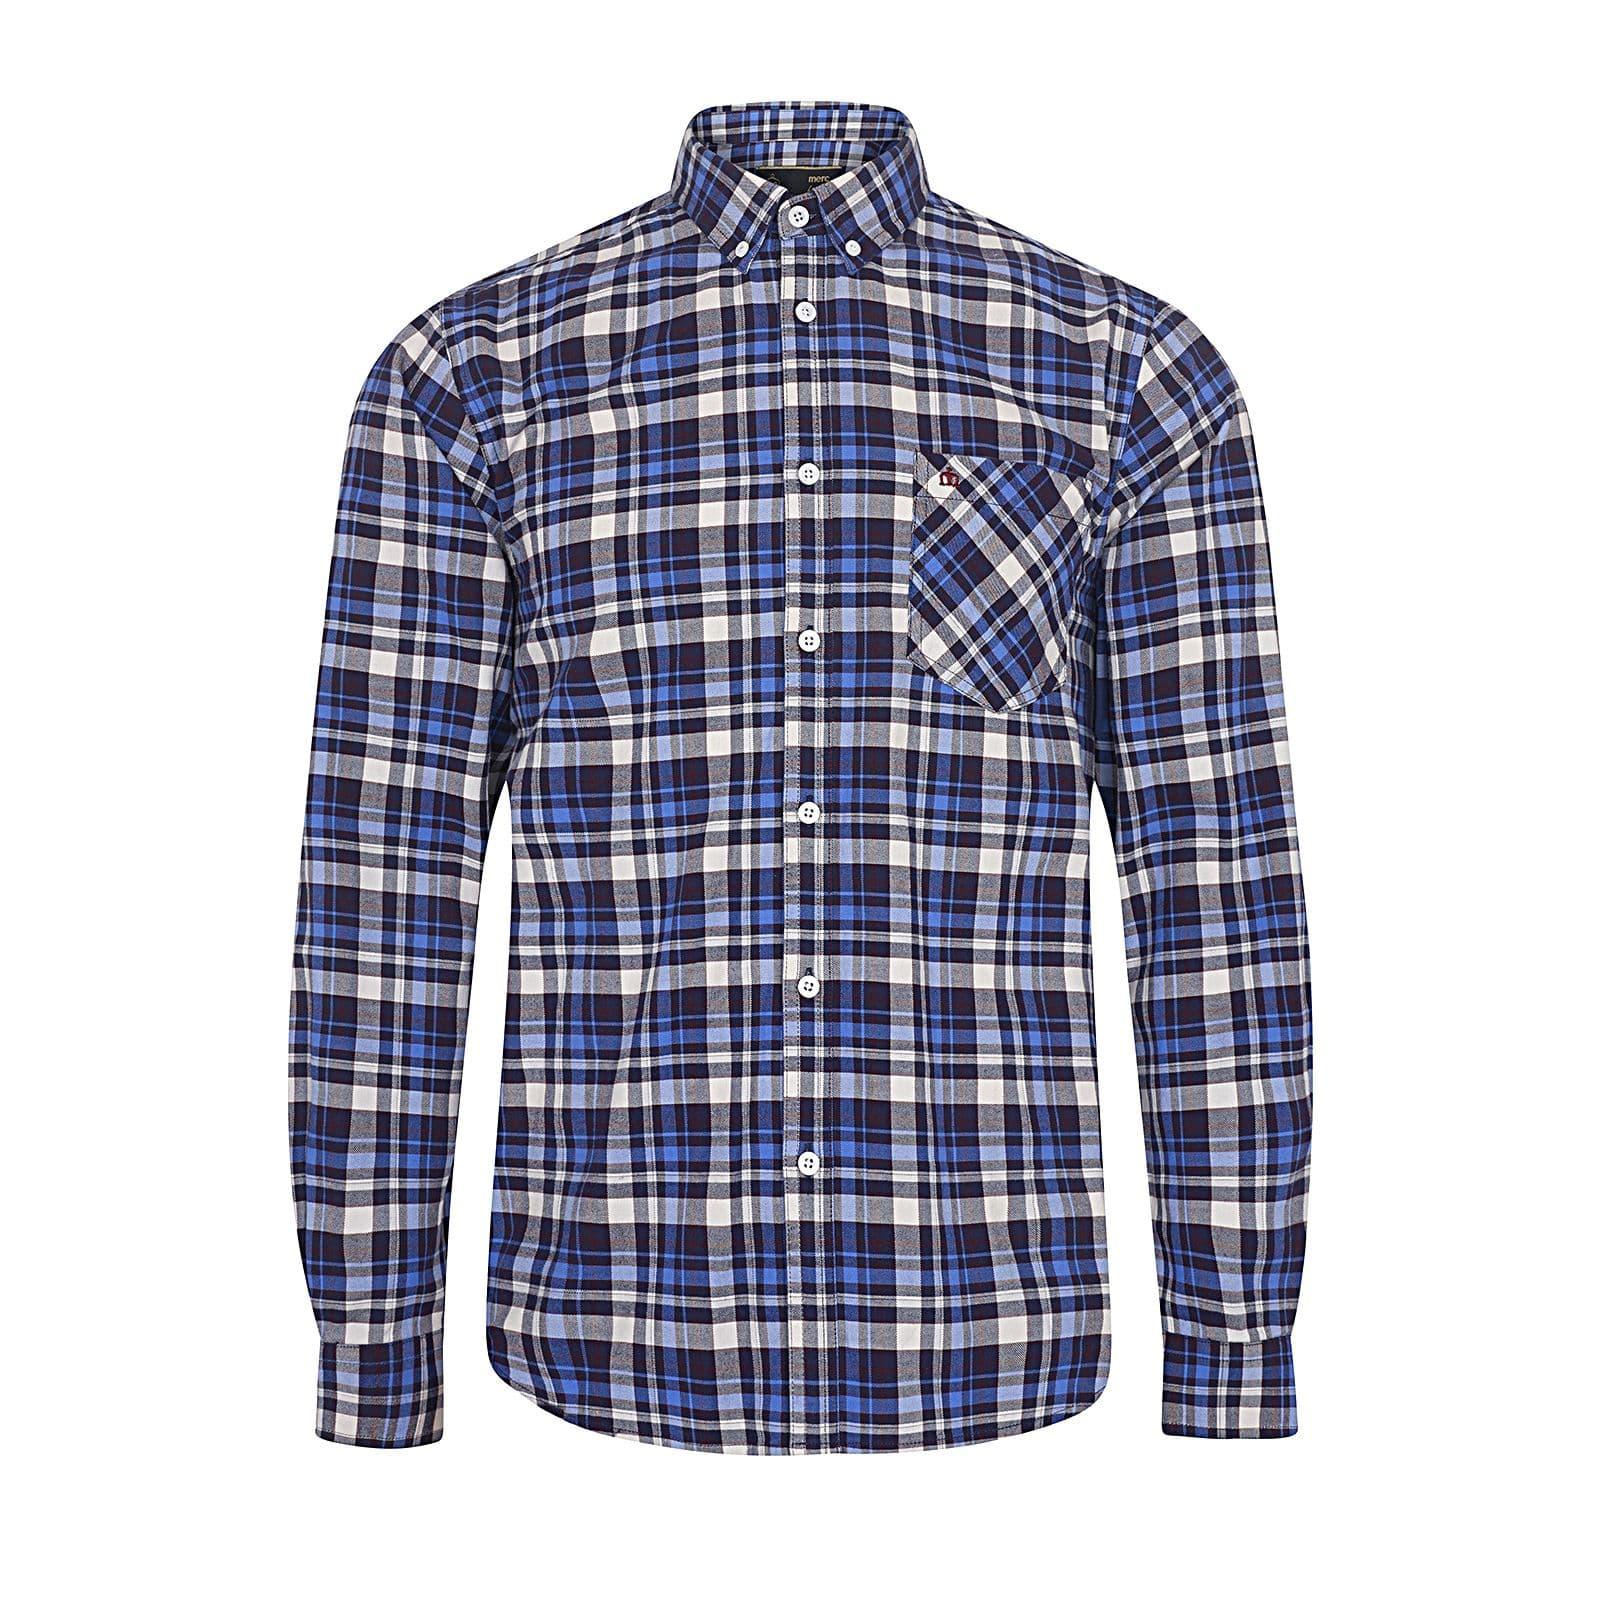 Рубашка GibbonsРубашки под заказ<br><br><br>Артикул: 1517209<br>Материал: 100% хлопок<br>Цвет: синий<br>Пол: Мужской